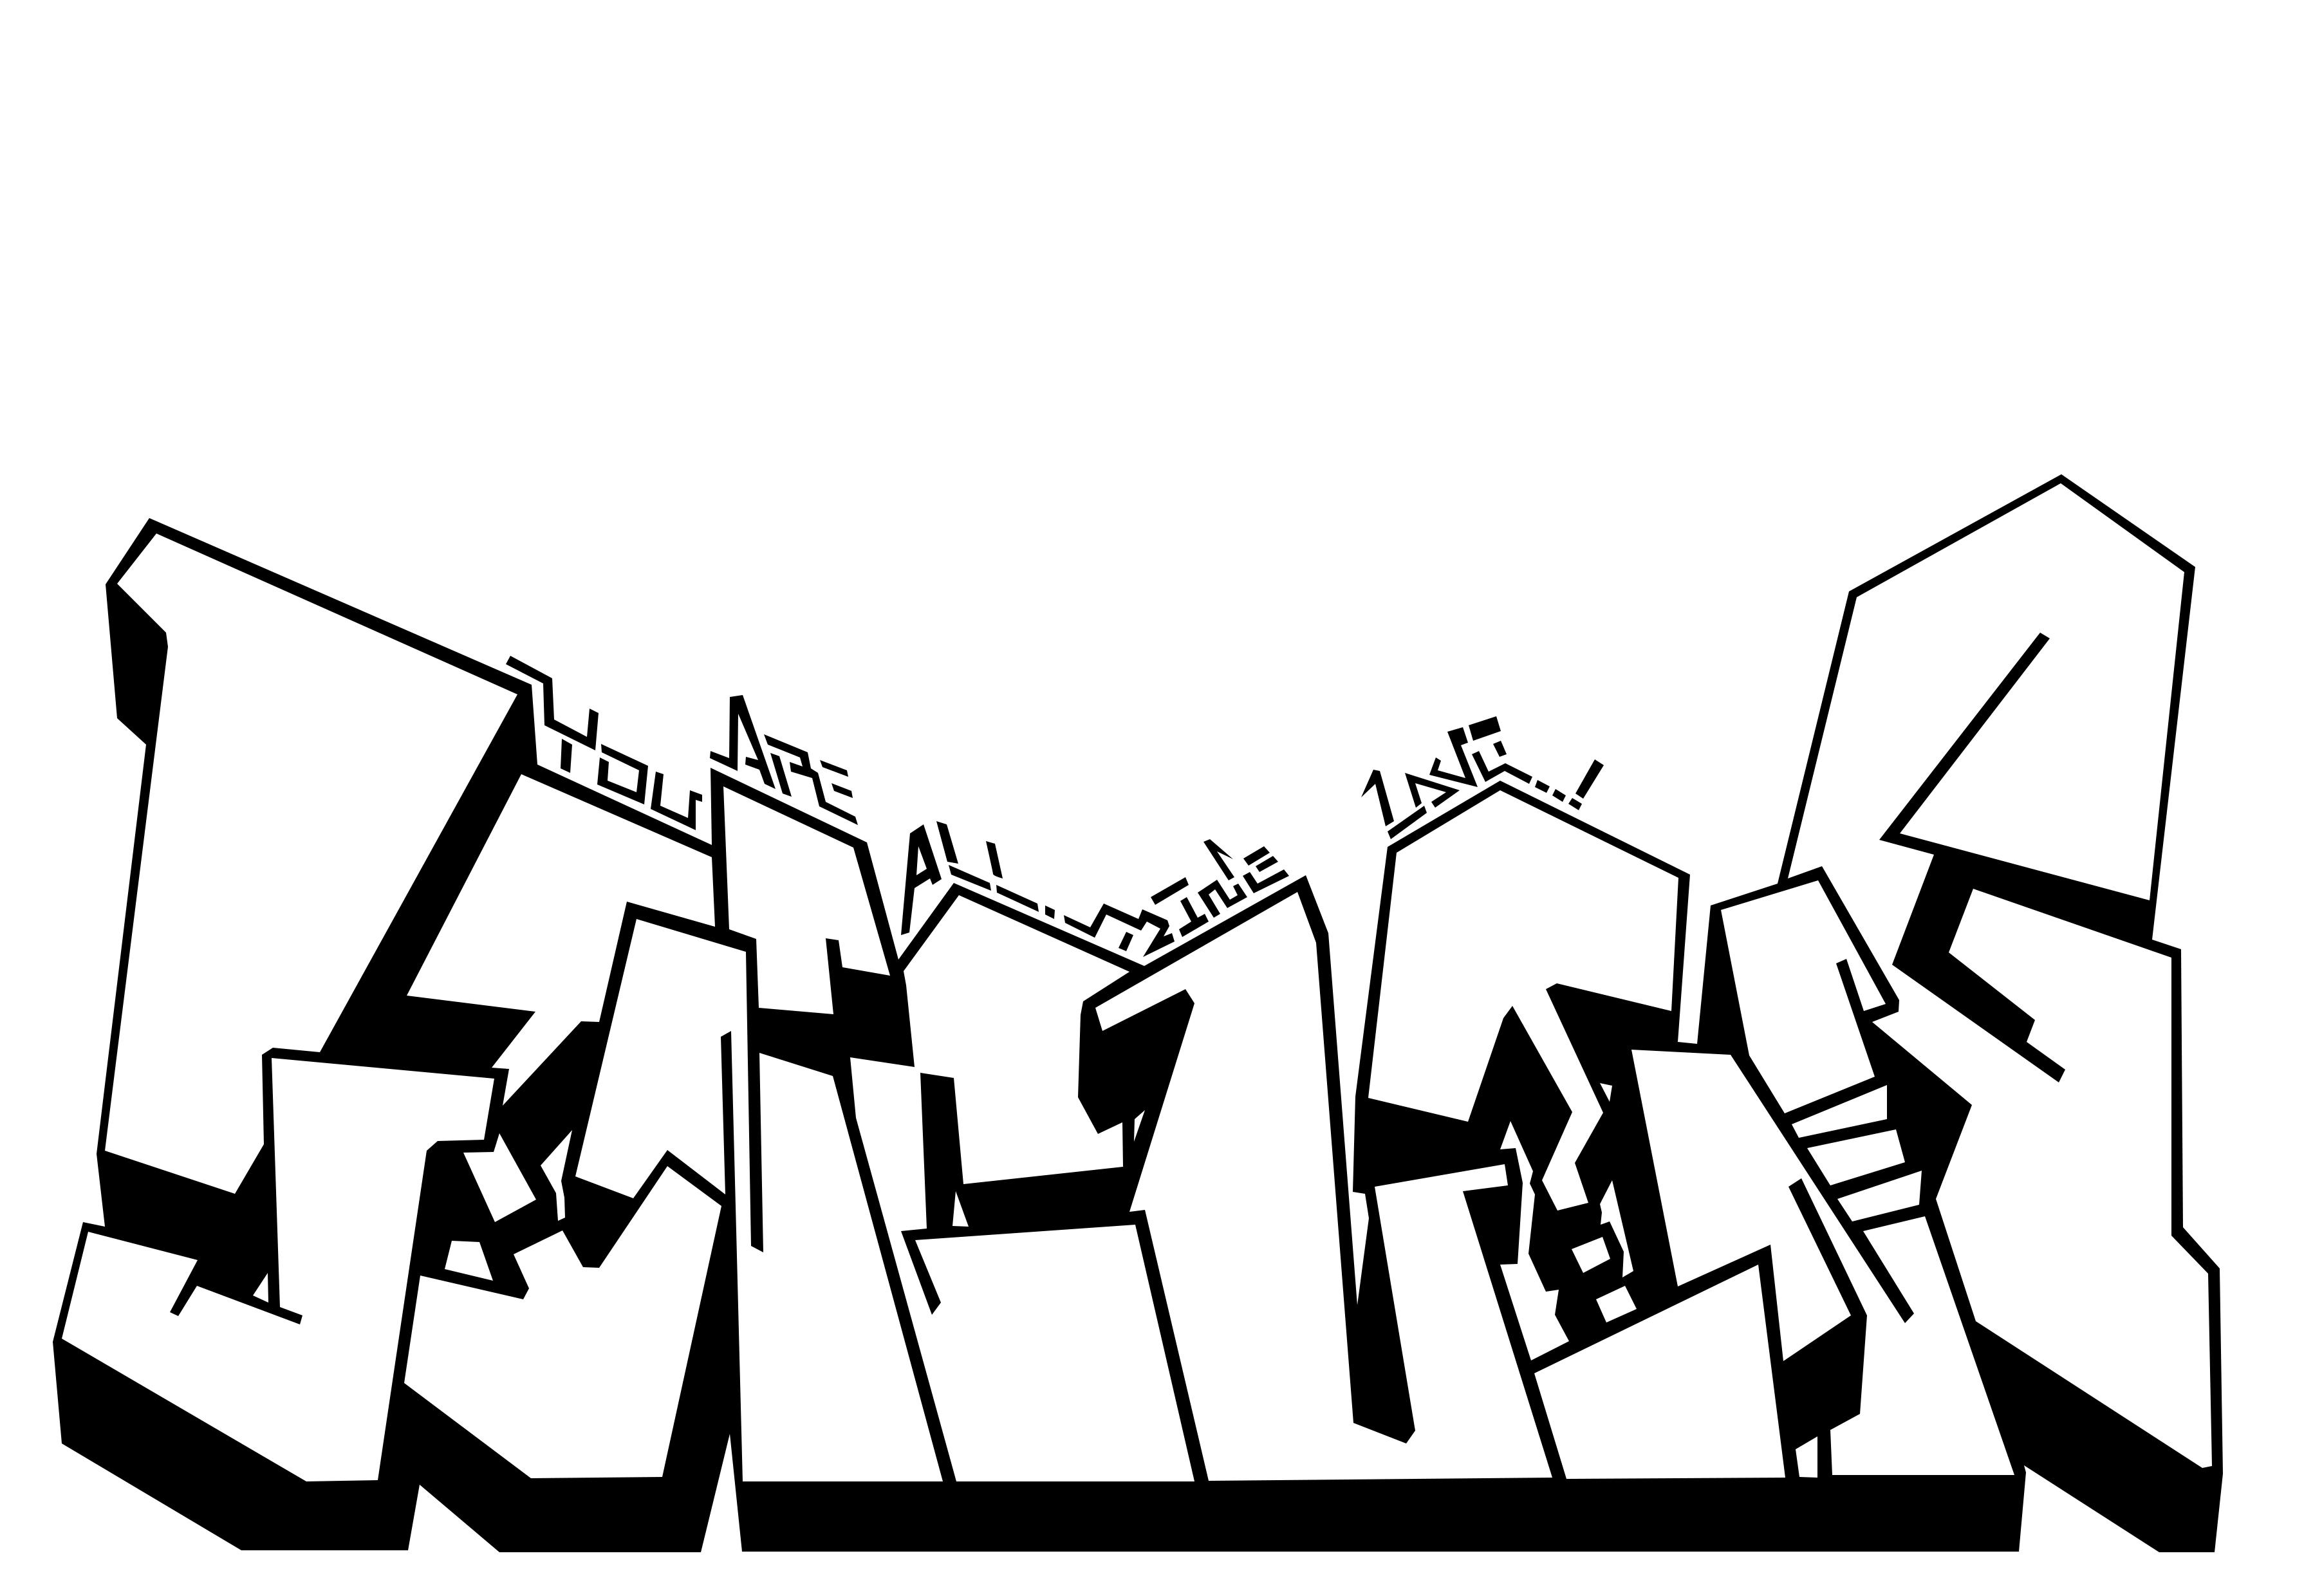 KuugaL